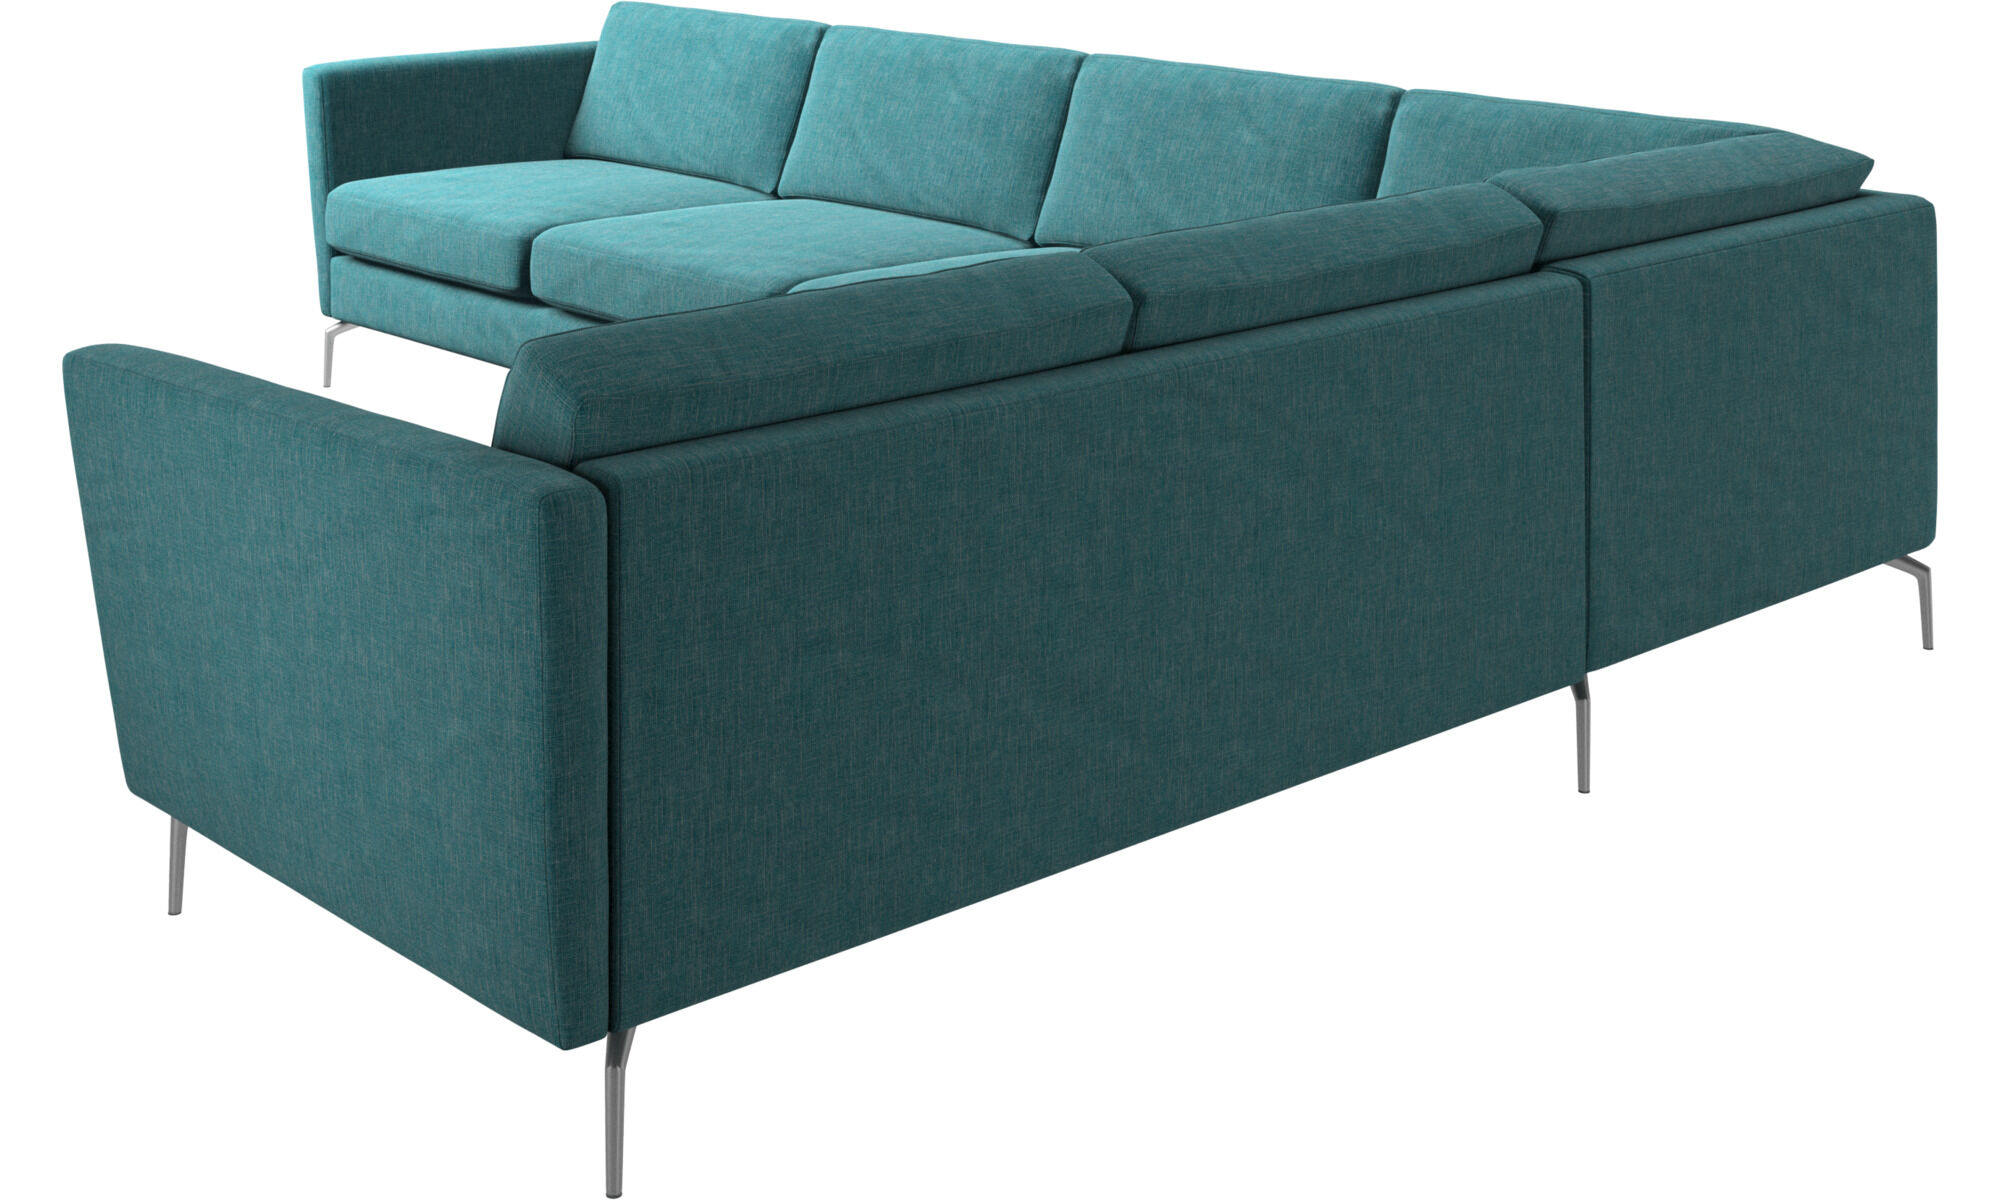 ... Corner Sofas   Osaka Corner Sofa, Regular Seat   Blue   Fabric ...